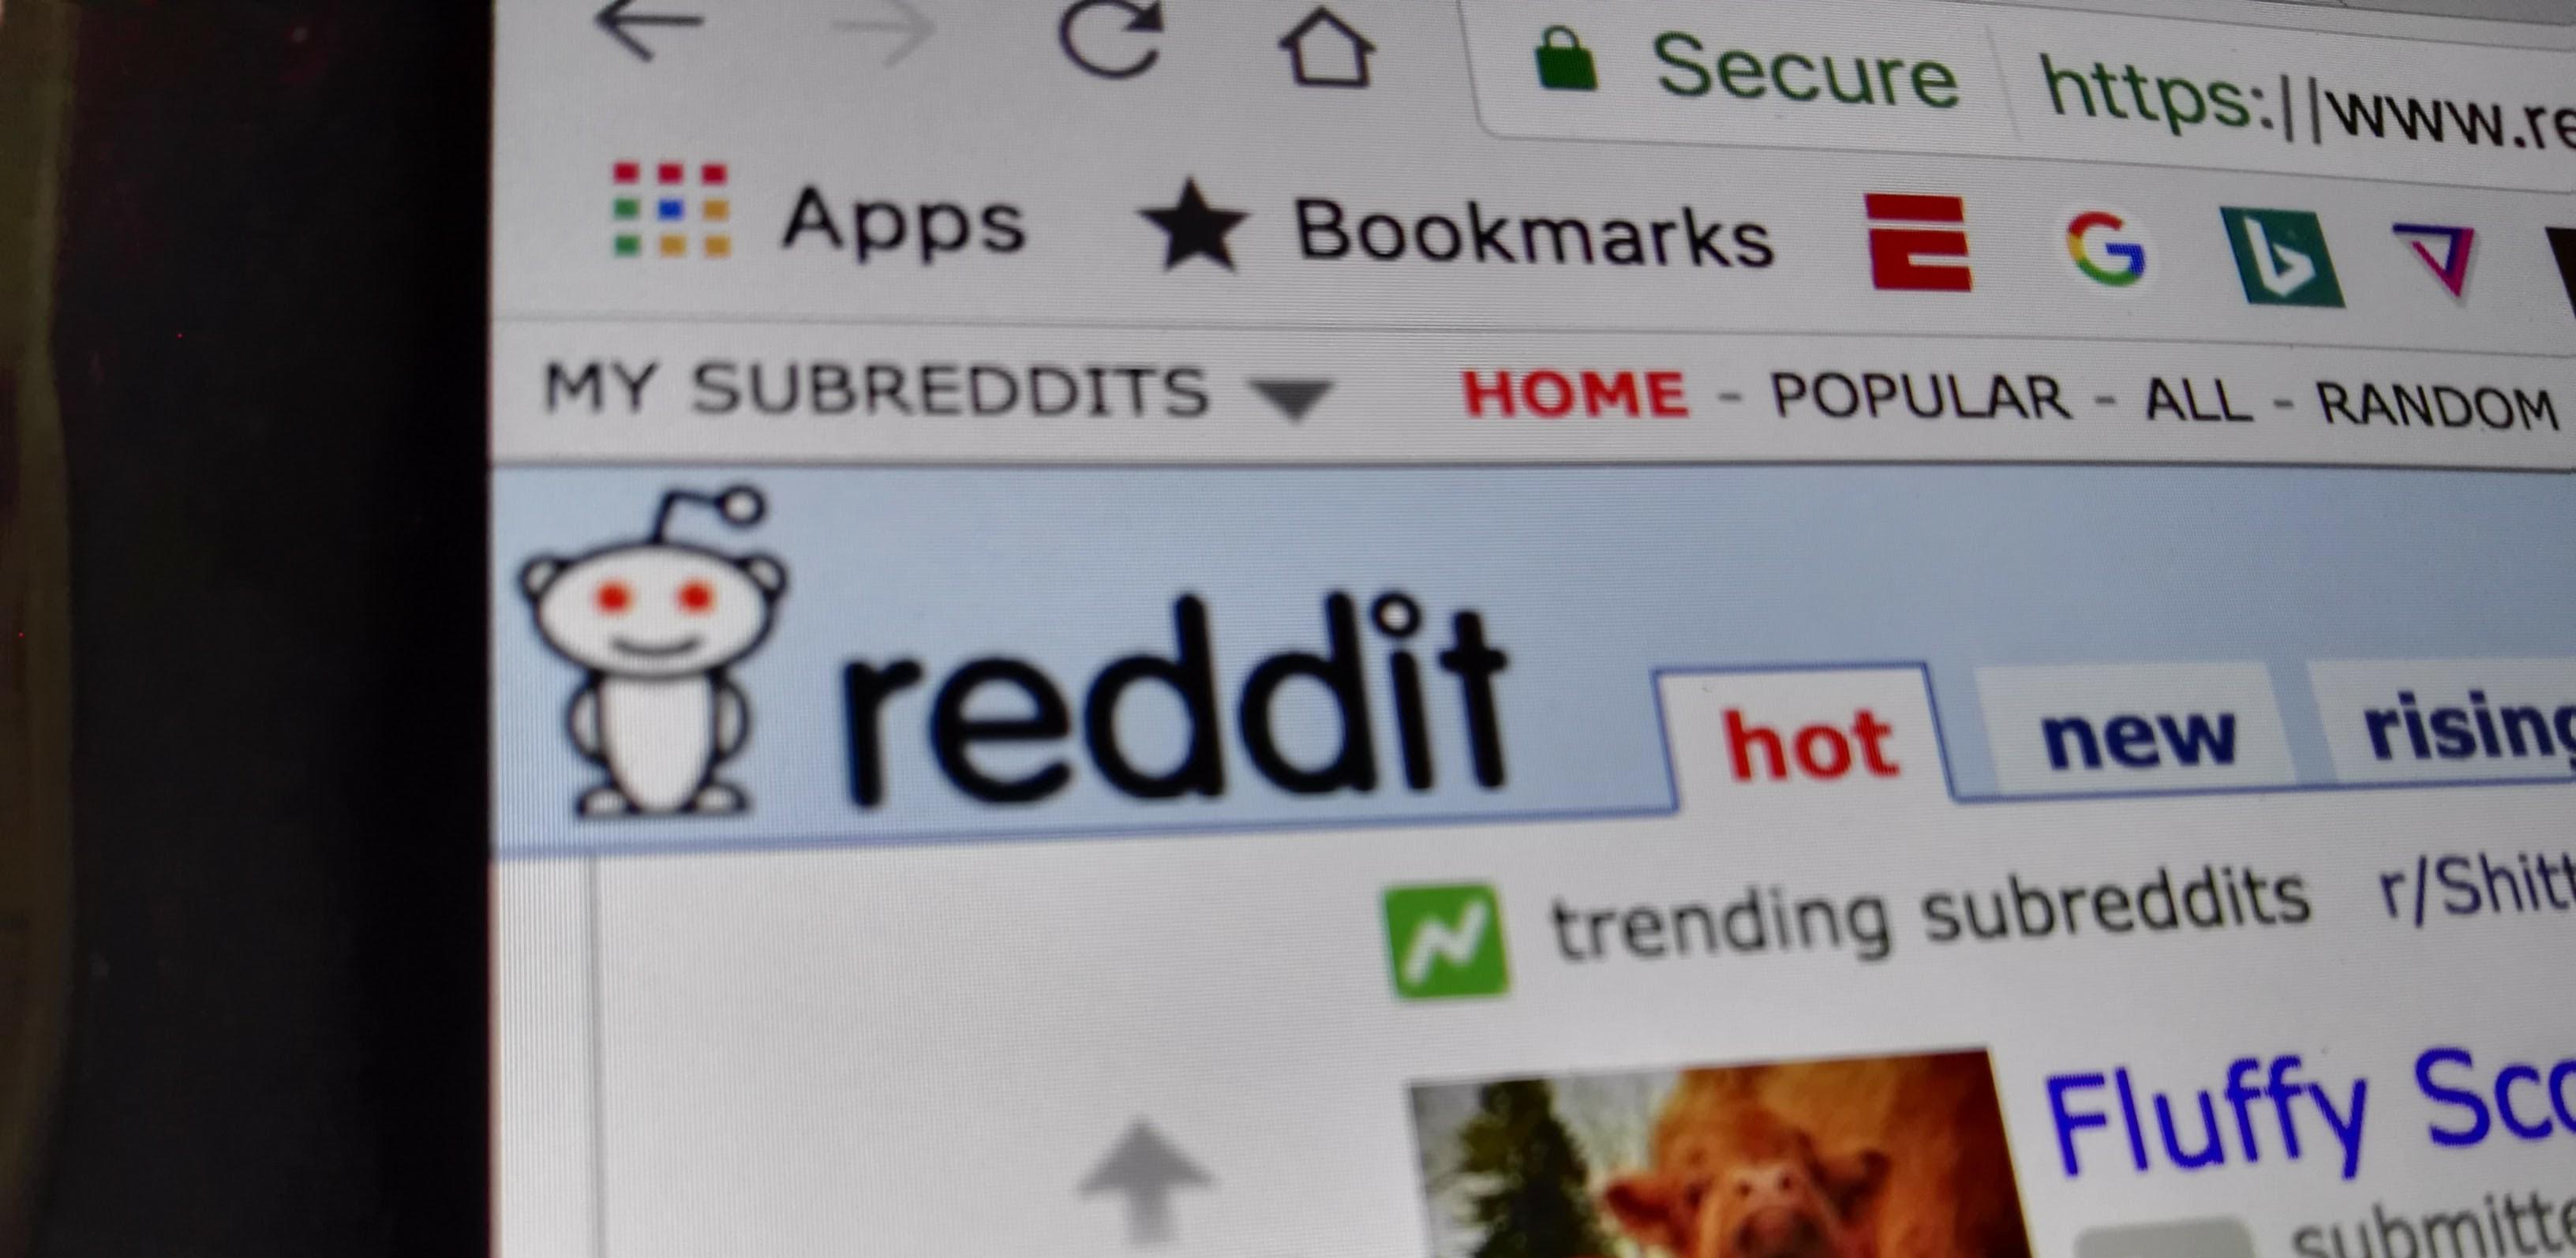 Mensa Practice Test Reddit